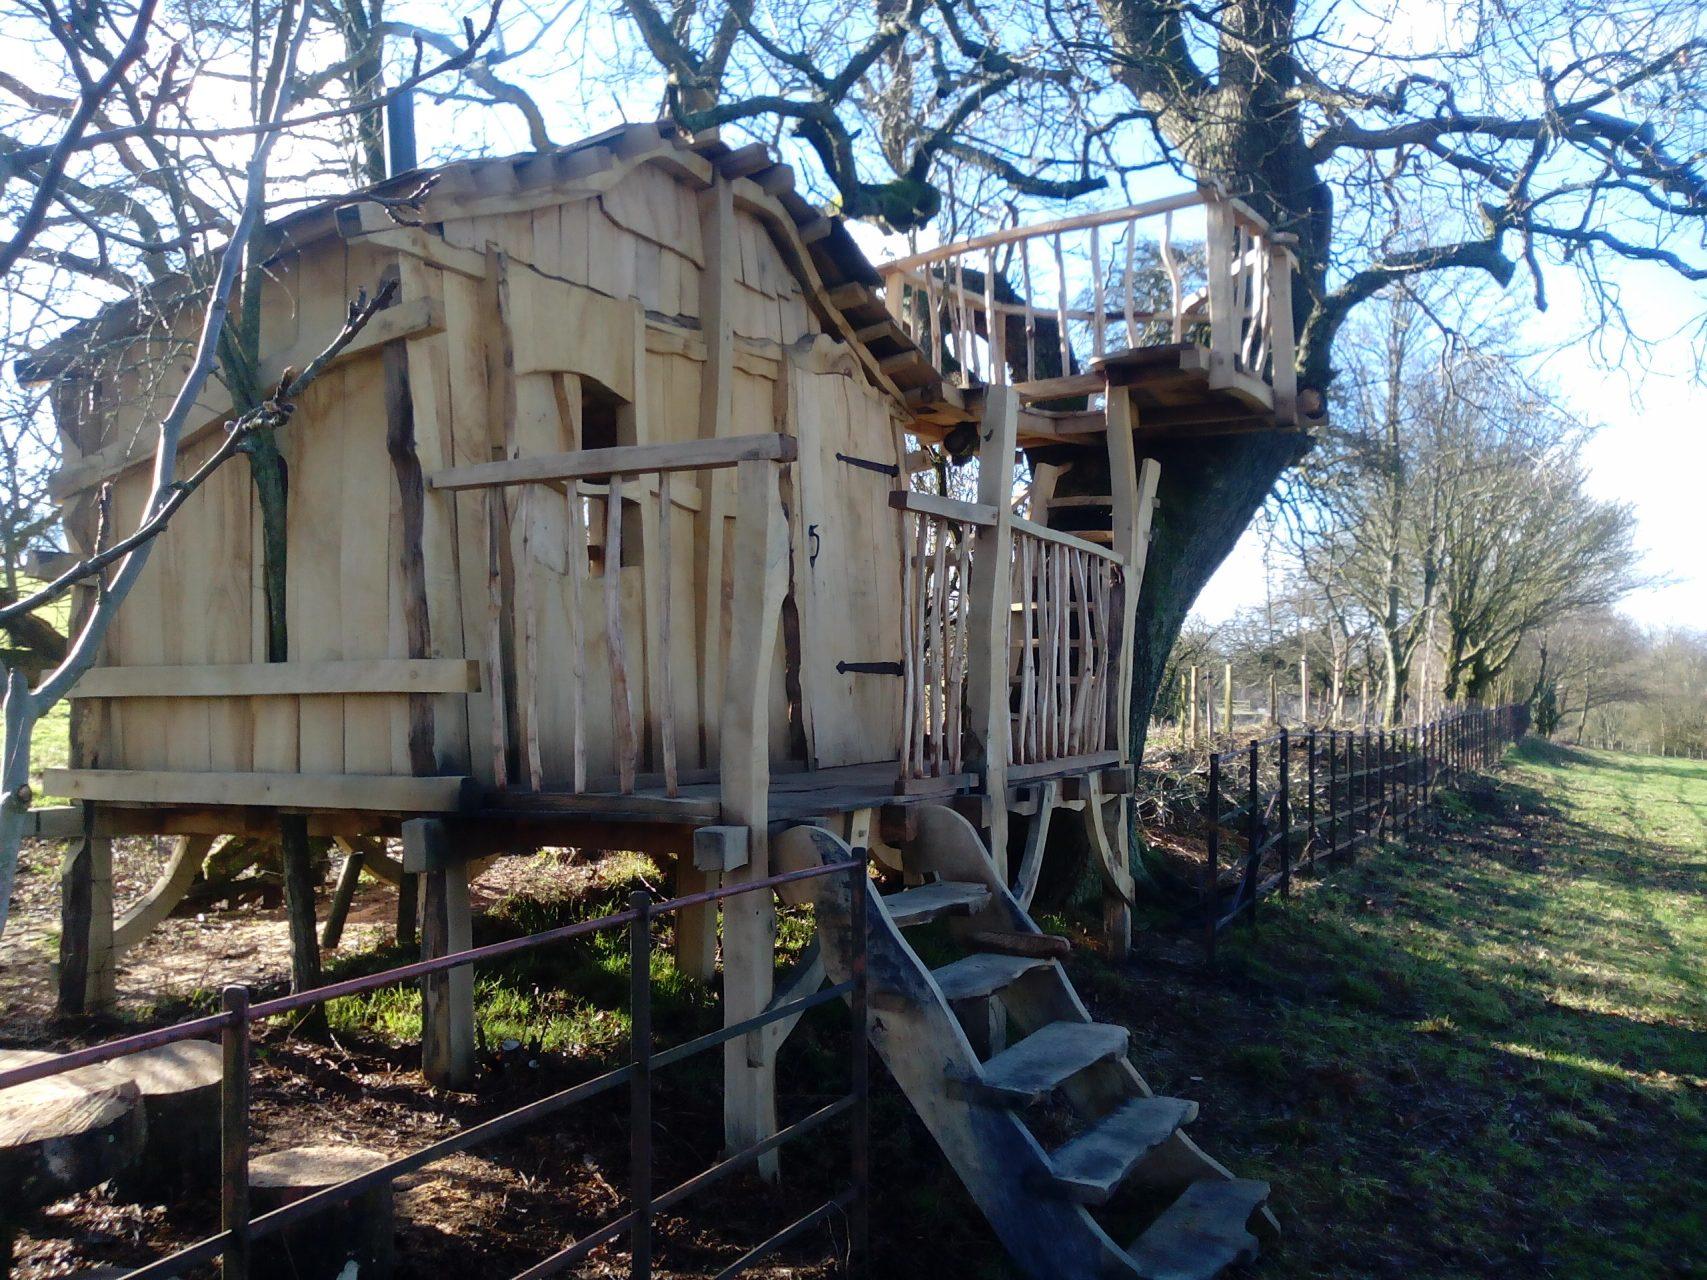 hungerfotd treehouse